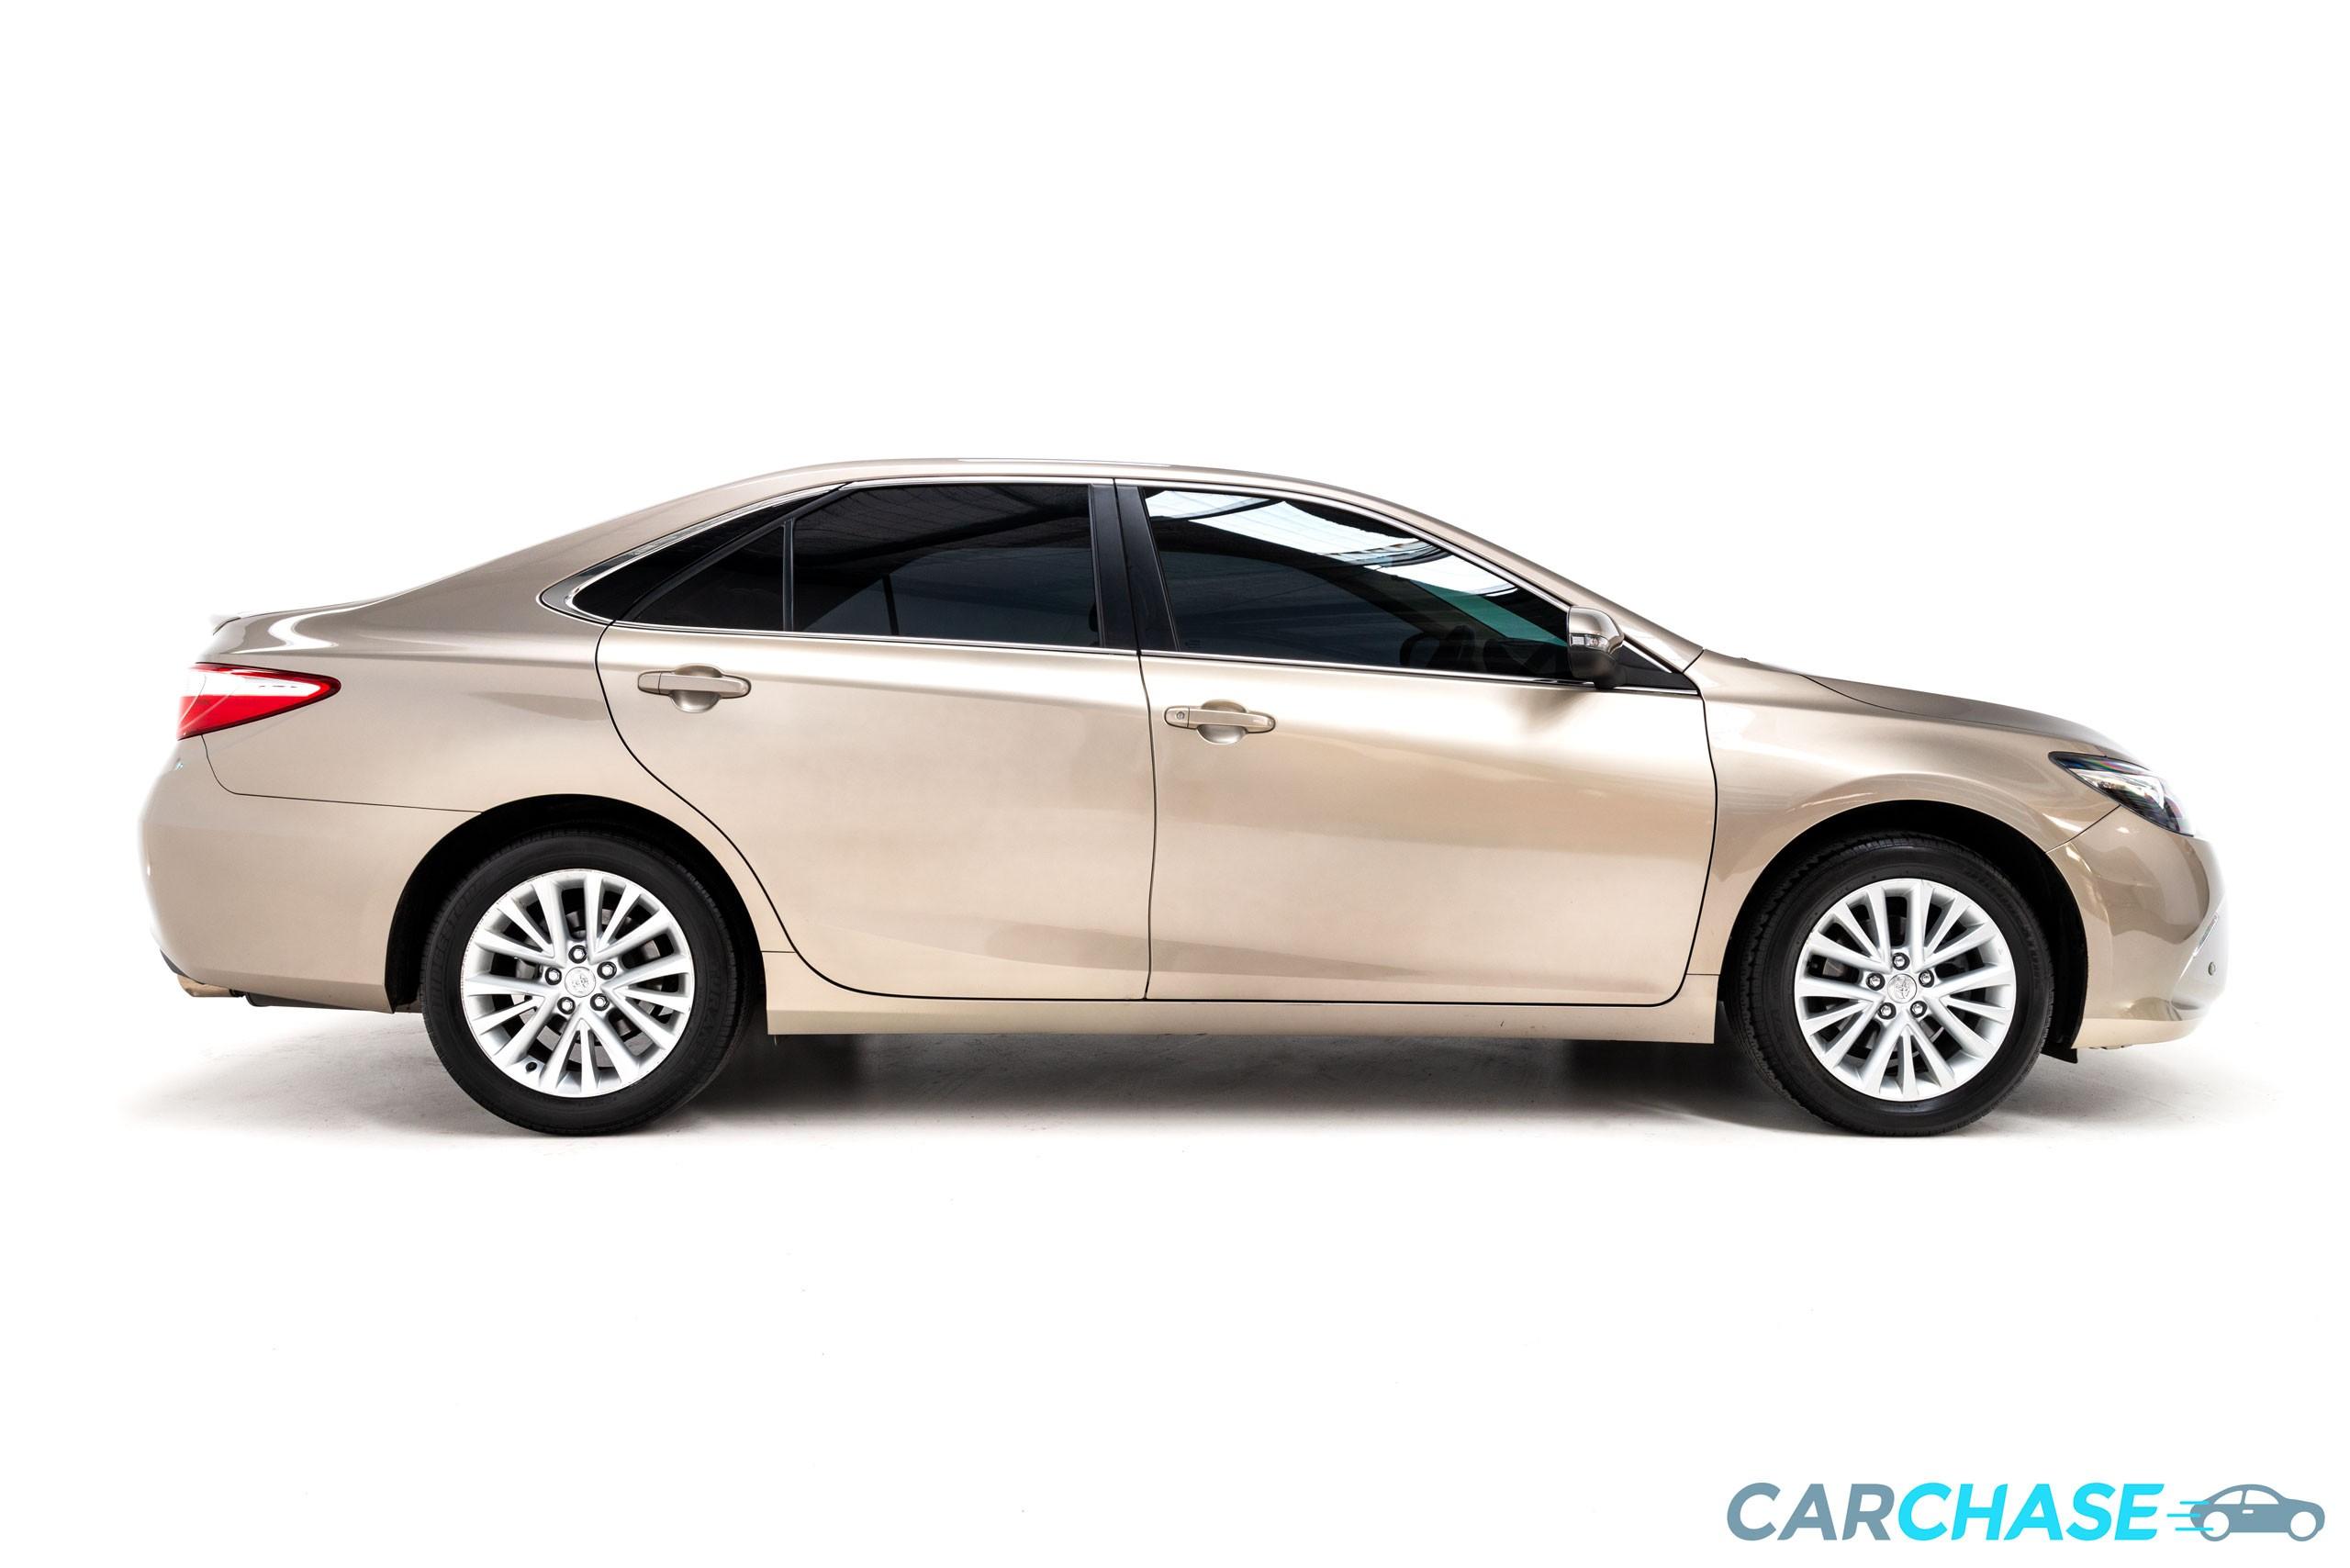 Image of right profile of 2015 Toyota Camry Atara SL